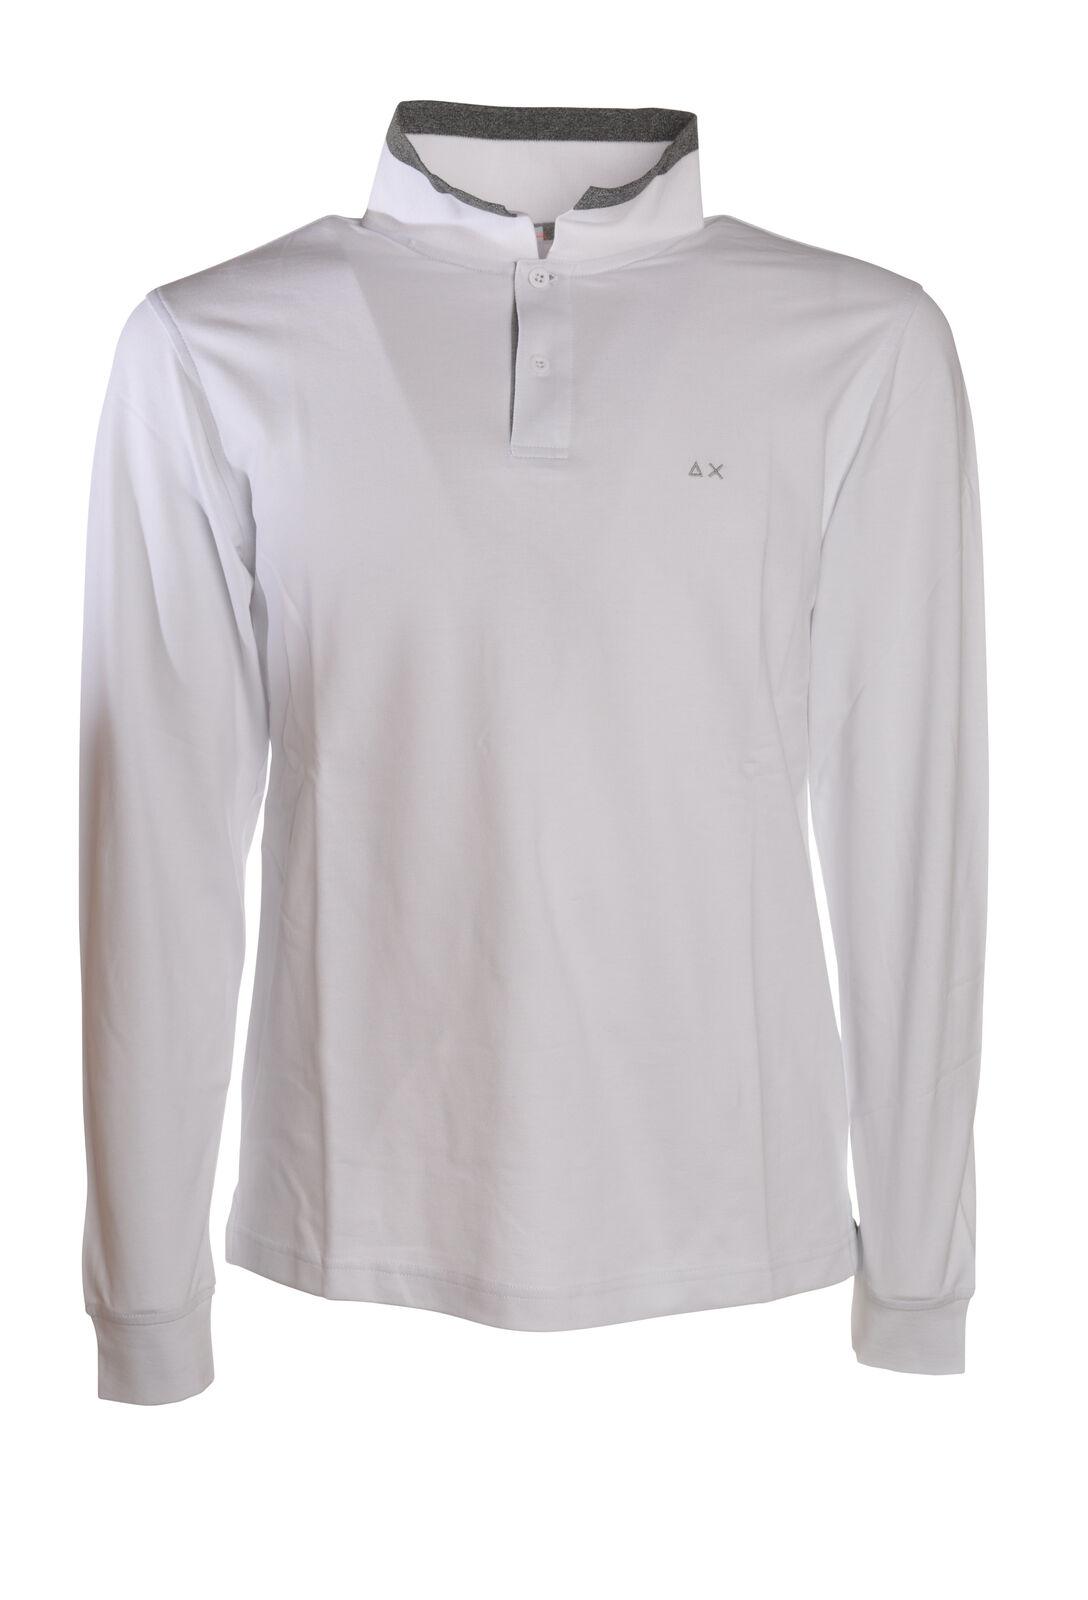 Sun 68 - Topwear Polo - Mann - white - 5651507C195247